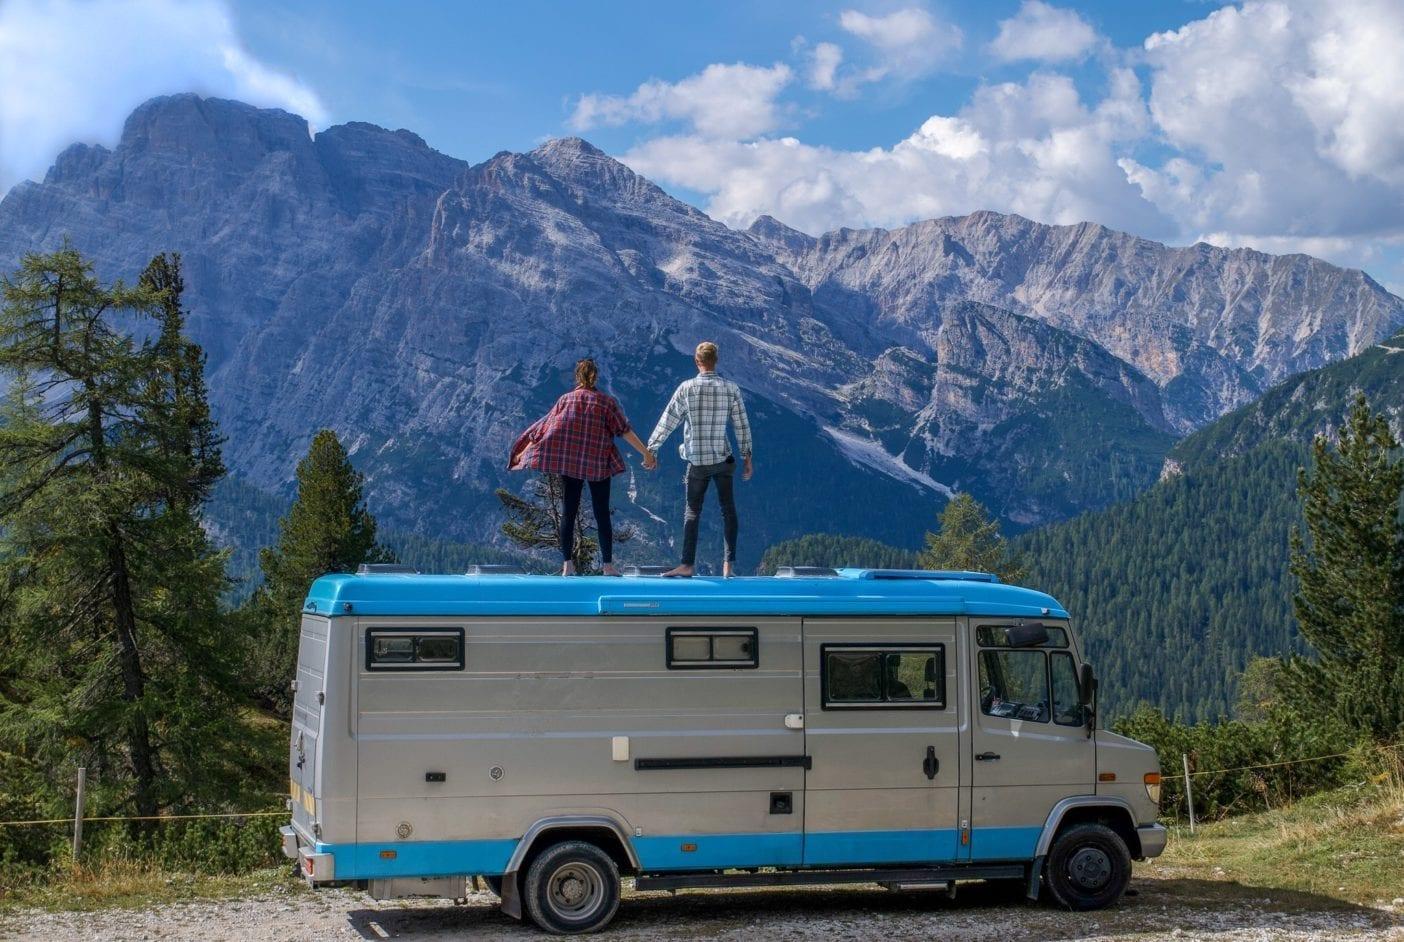 mercedes-612d-camper-van-vario-mountains-trip-sabatical-couple-traverling-usa